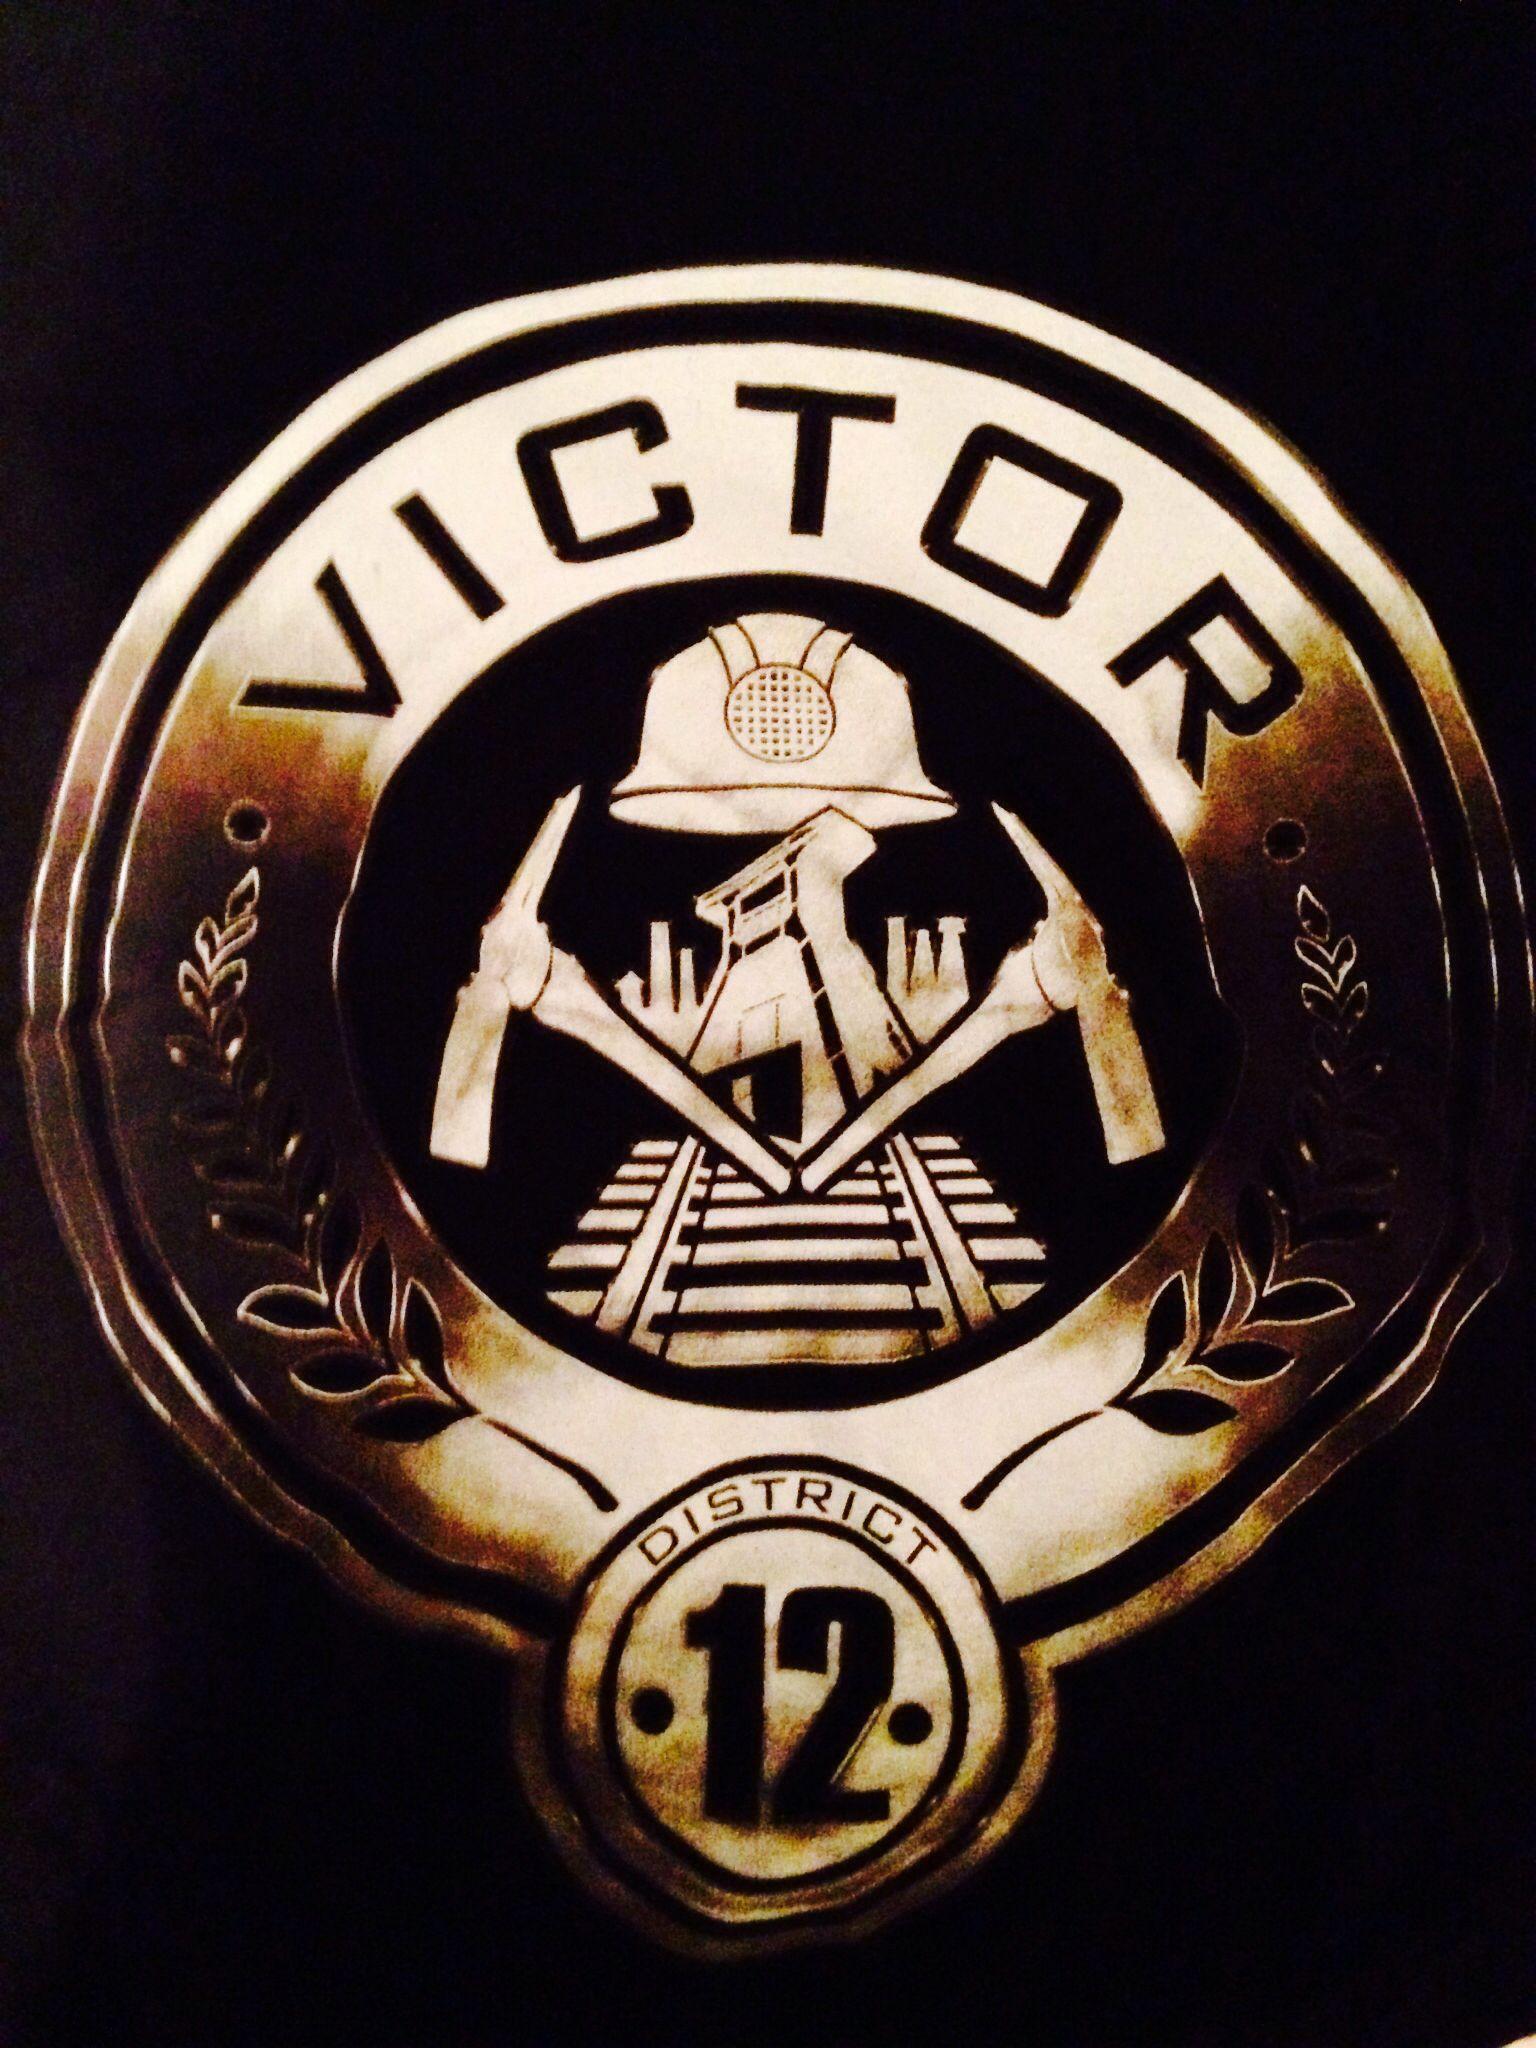 Hunger games district 12 victor maytheoddsbeeverinyourfavor hunger games district 12 victor buycottarizona